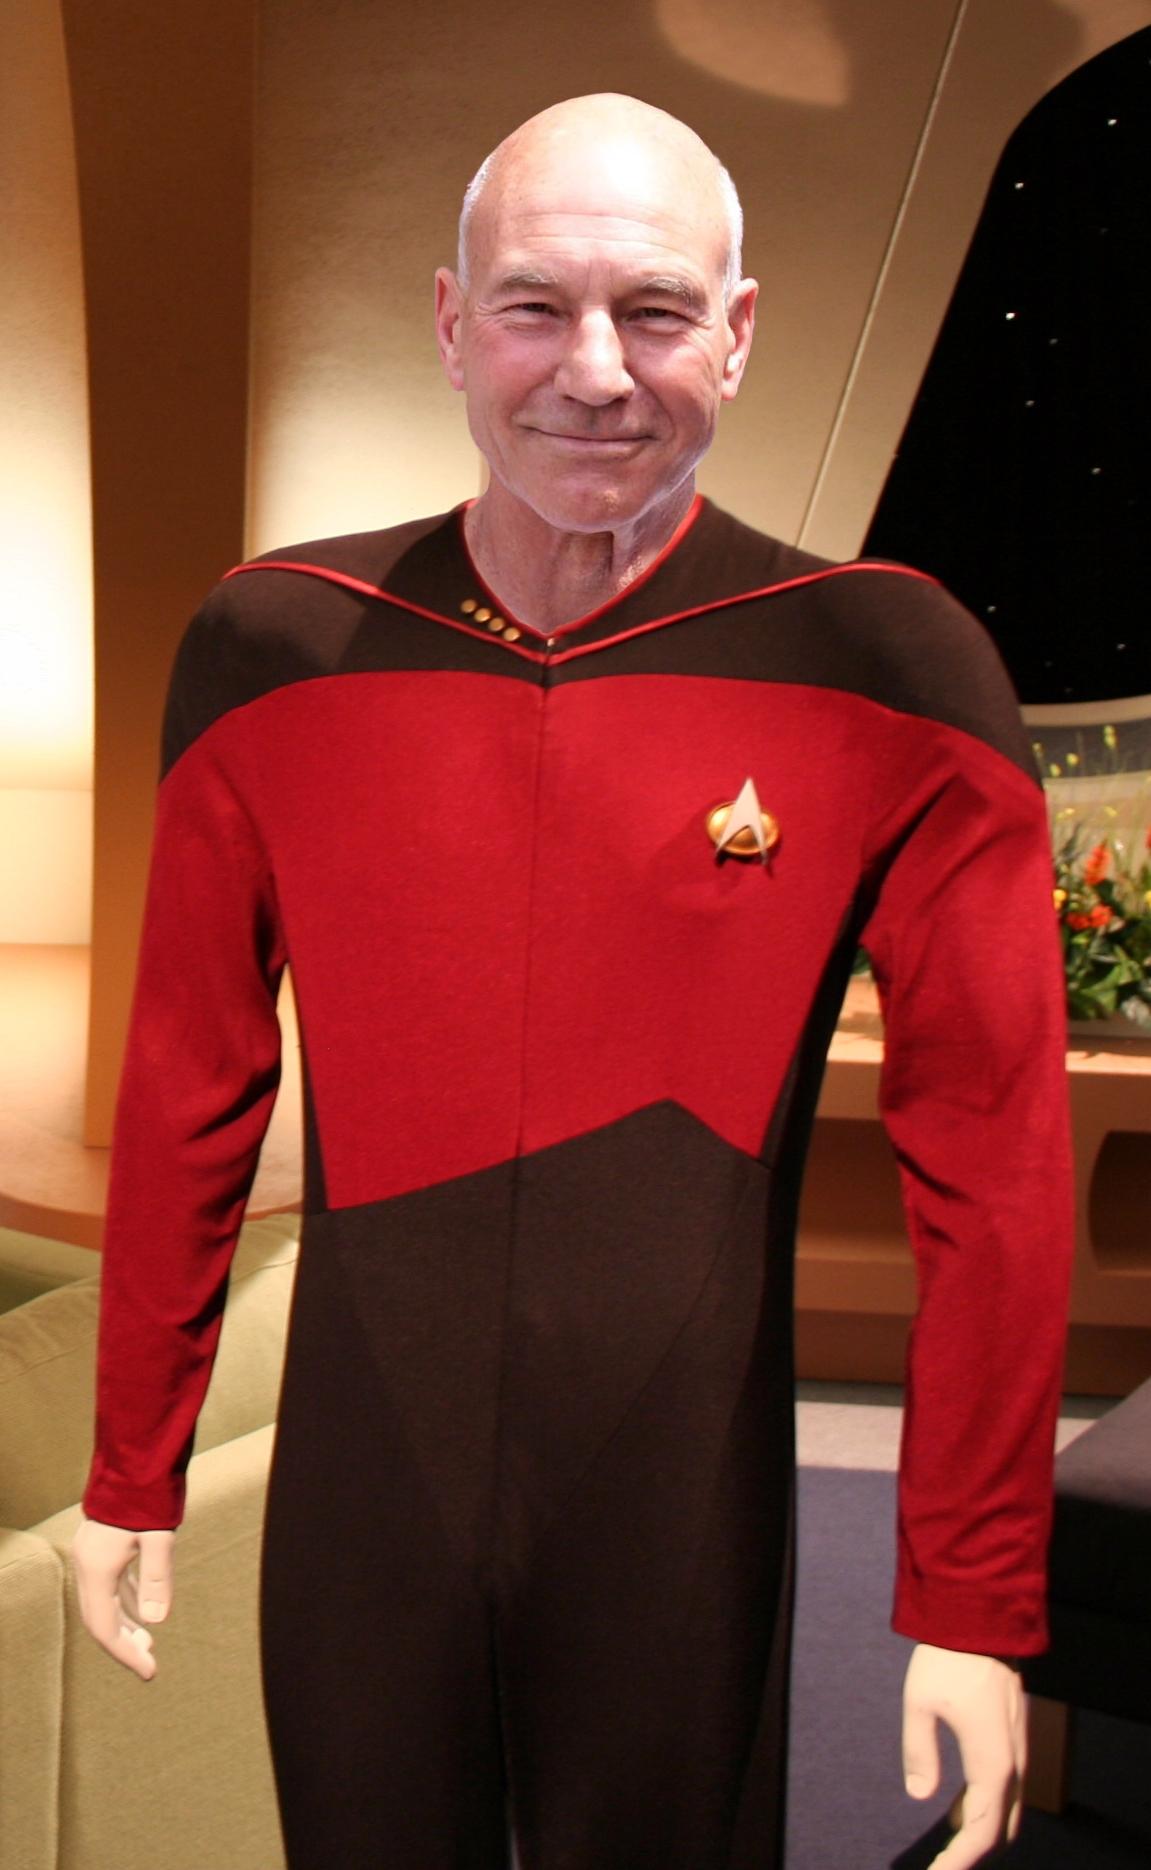 Jean-Luc Picard - Wikipedia, la enciclopedia libre